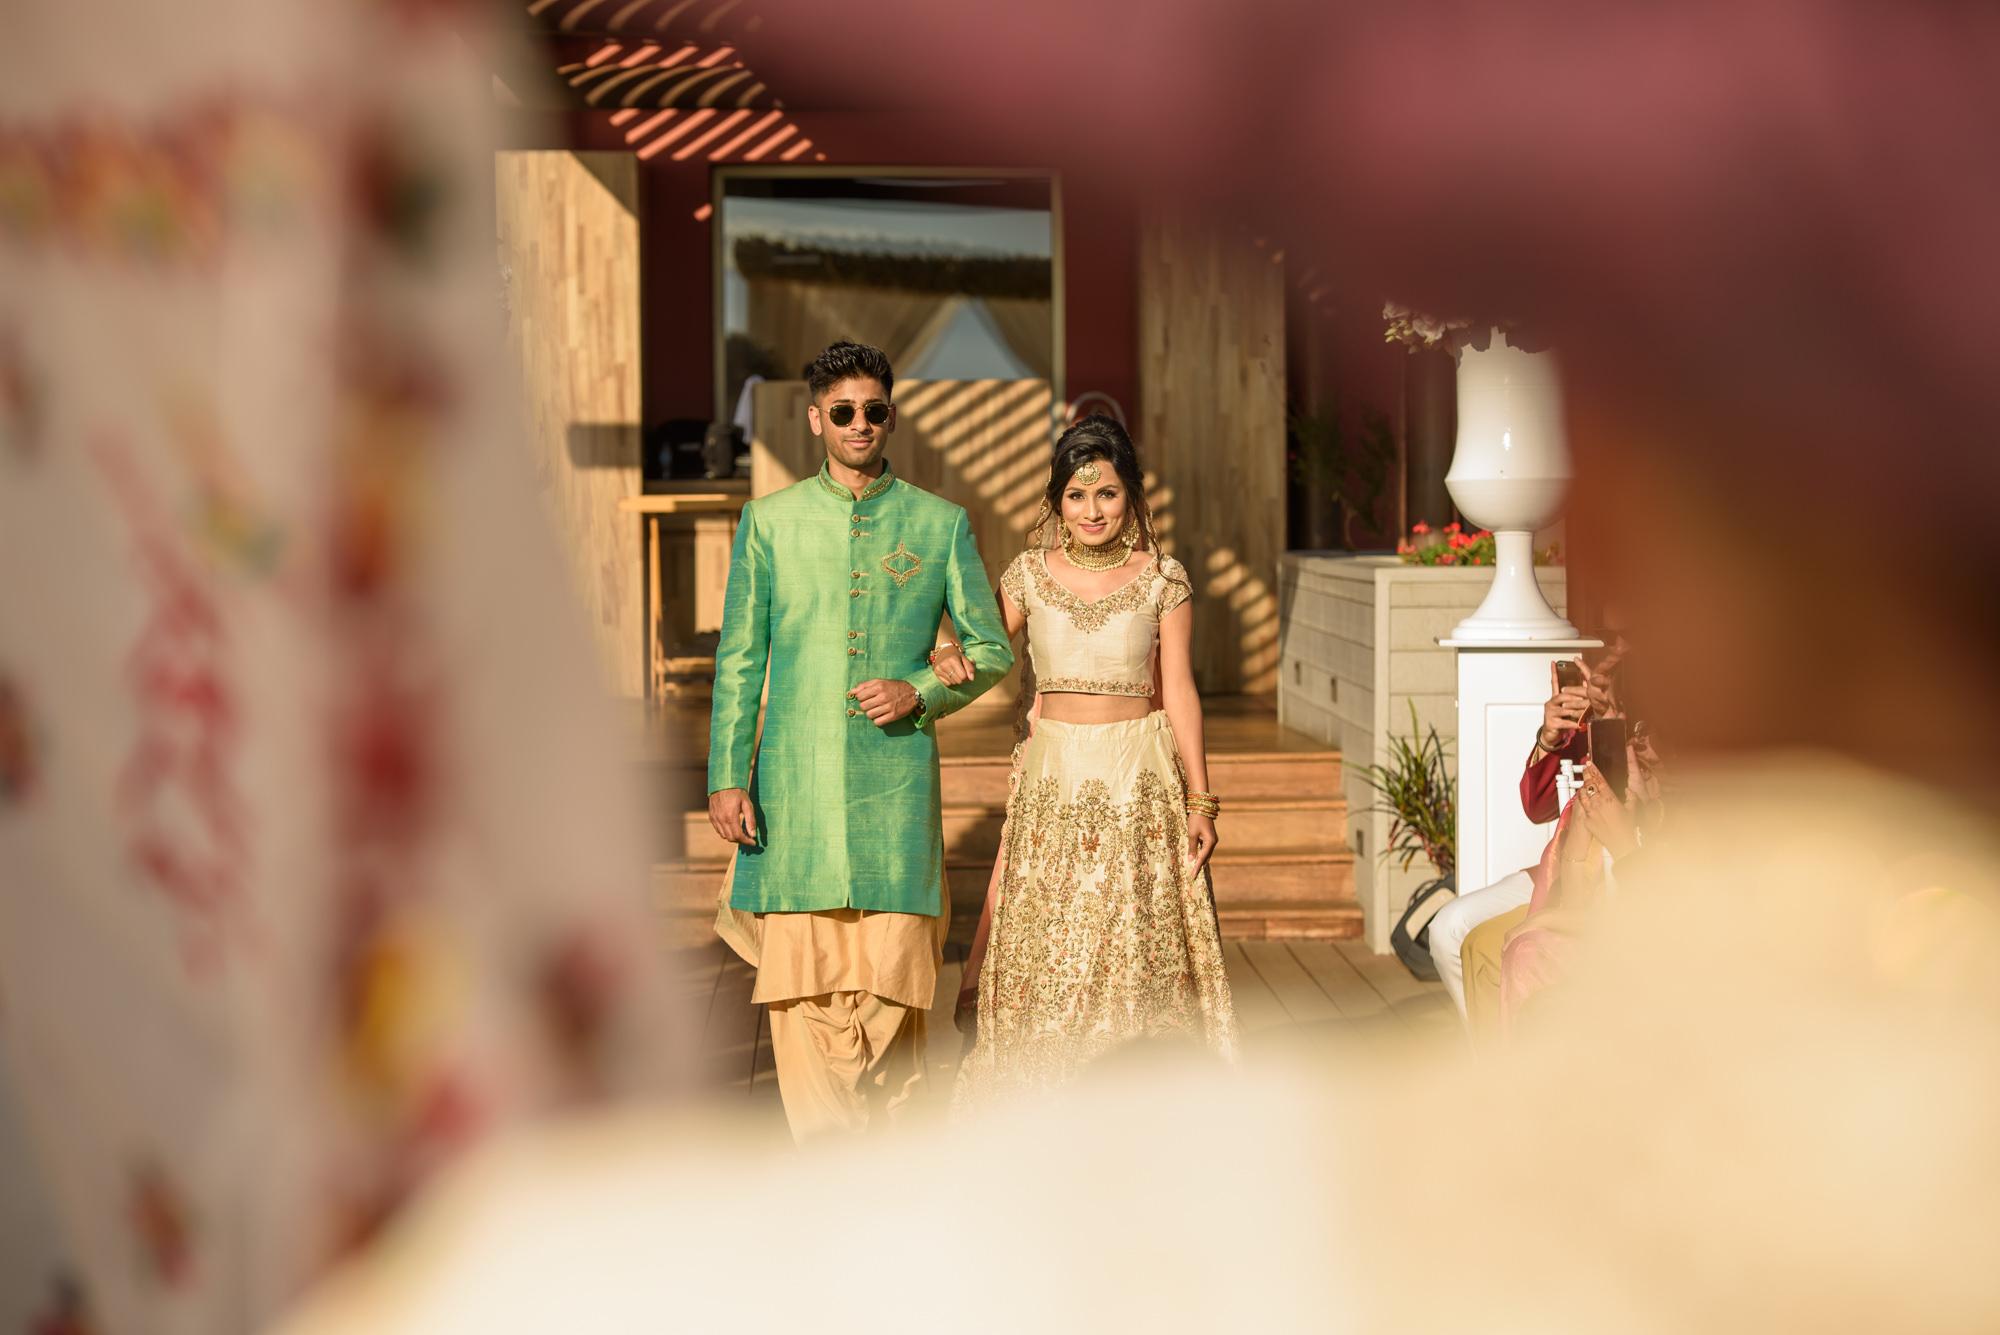 satnam photography wedding indian asian hindu destination wedding photographer tenerife ritz carlton abama-139.jpg